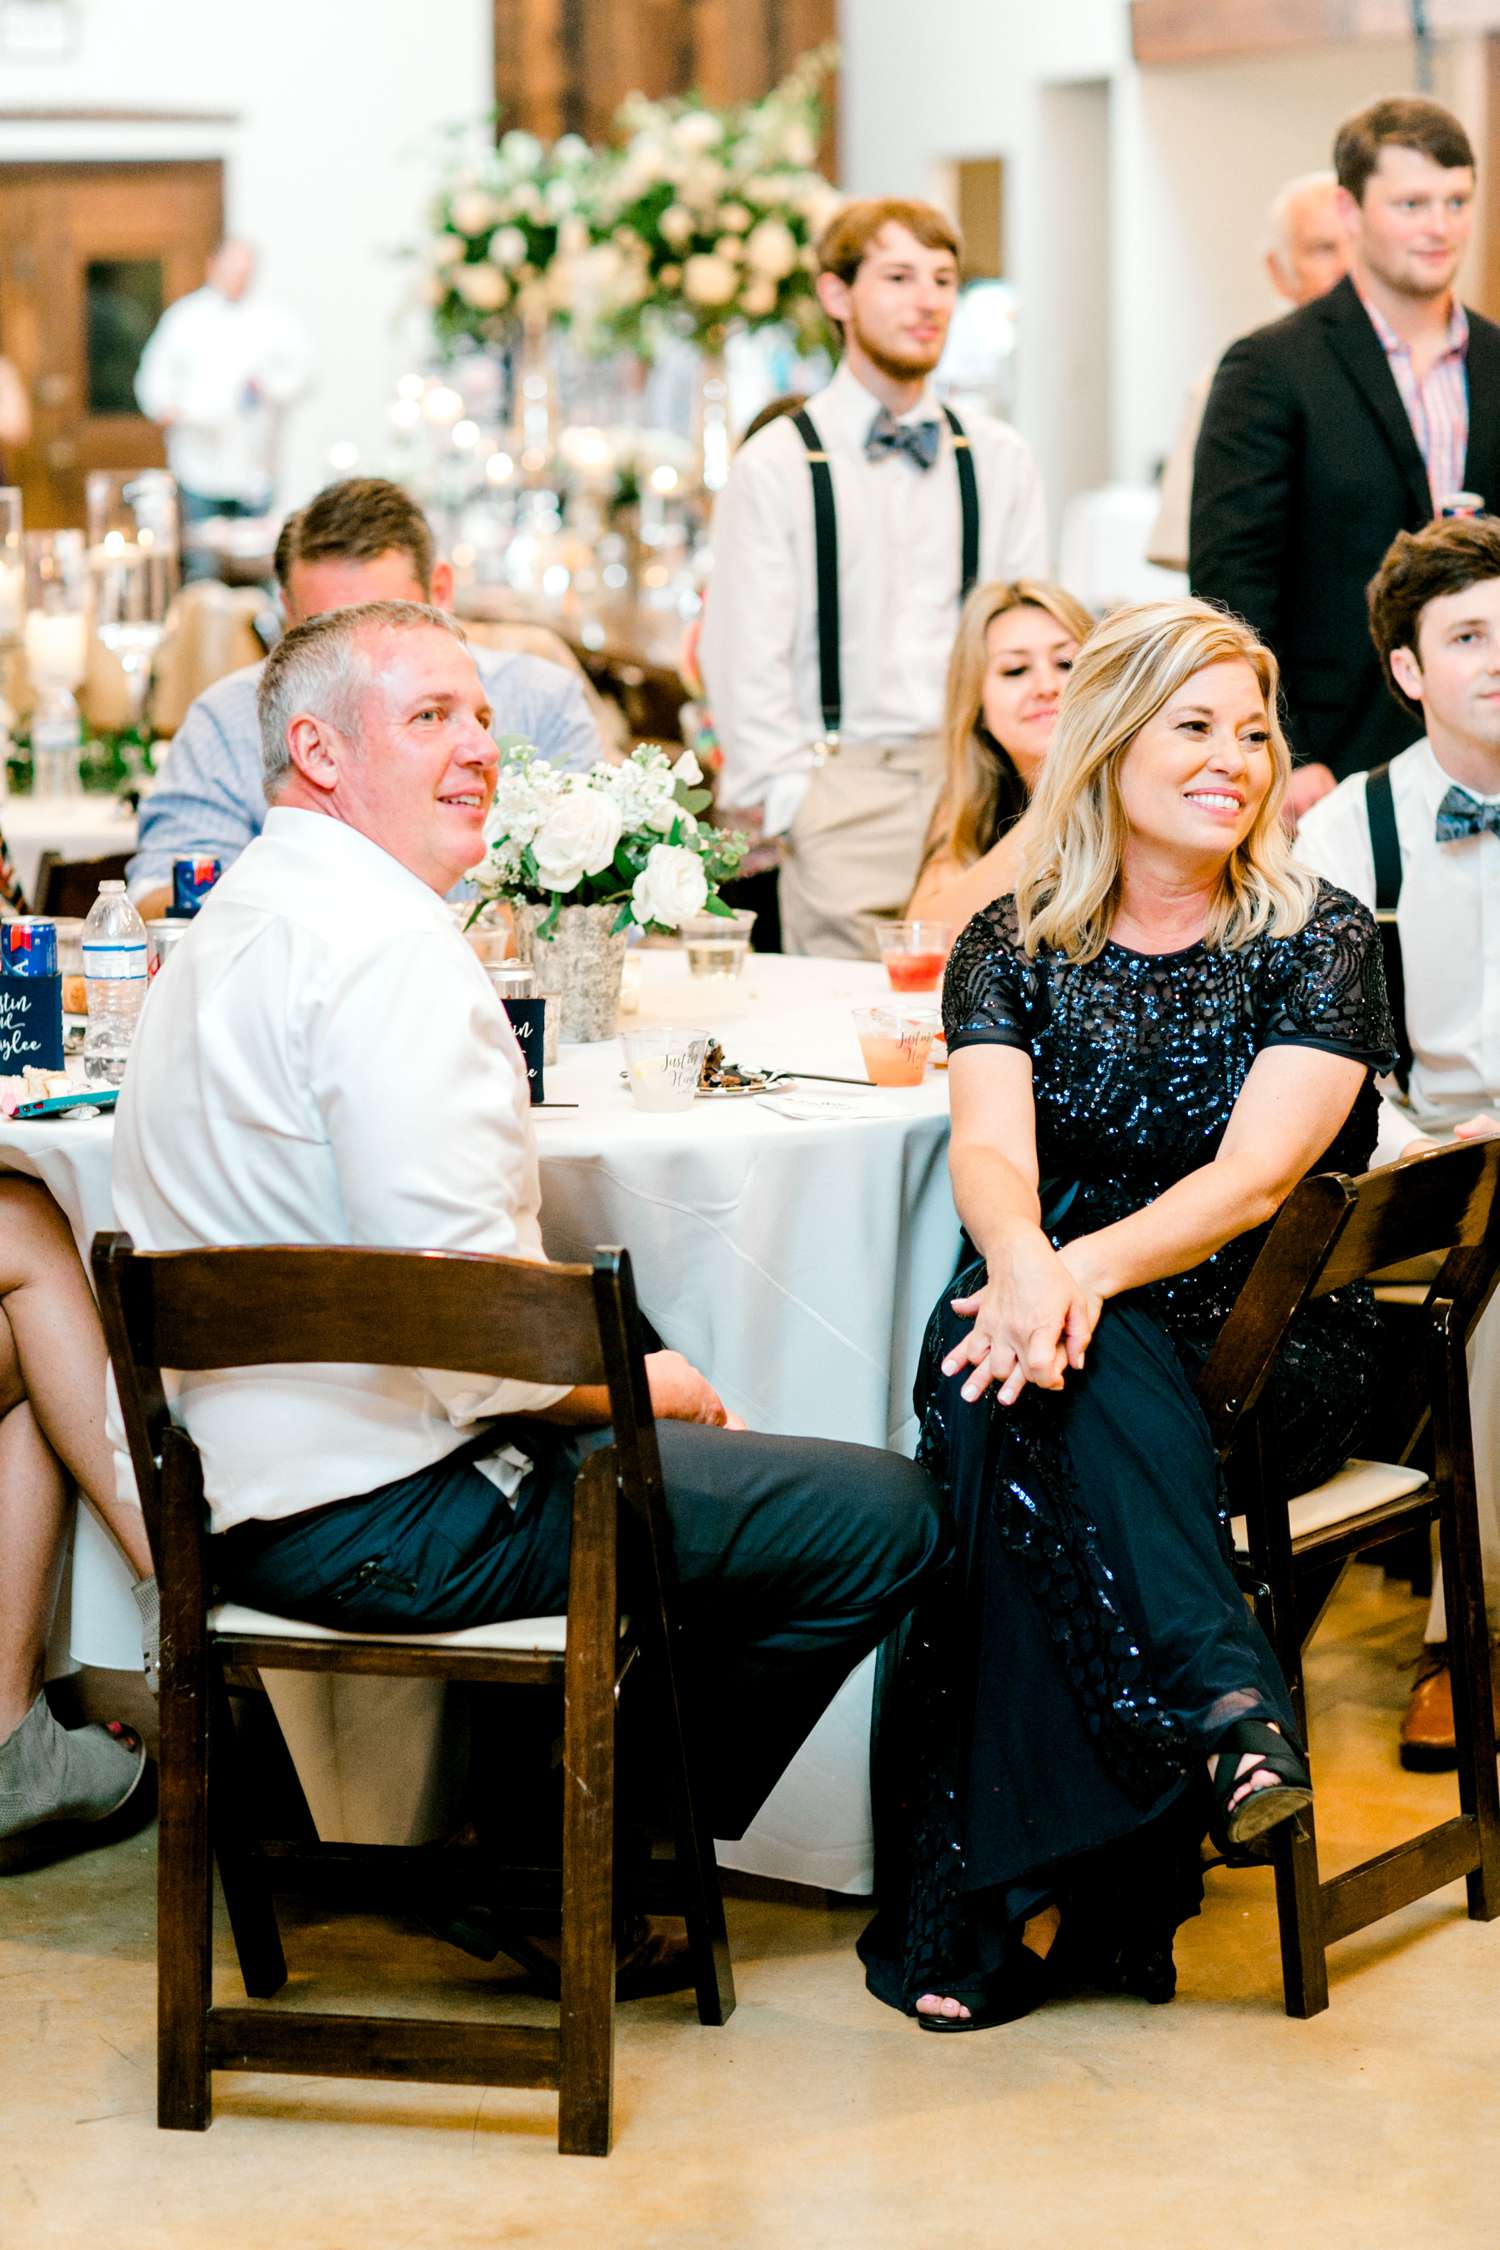 HAYLEE+JUSTIN+GREGORY+HERITAGE_HAUS_AUSTIN_TEXAS_WEDDING_0181.jpg